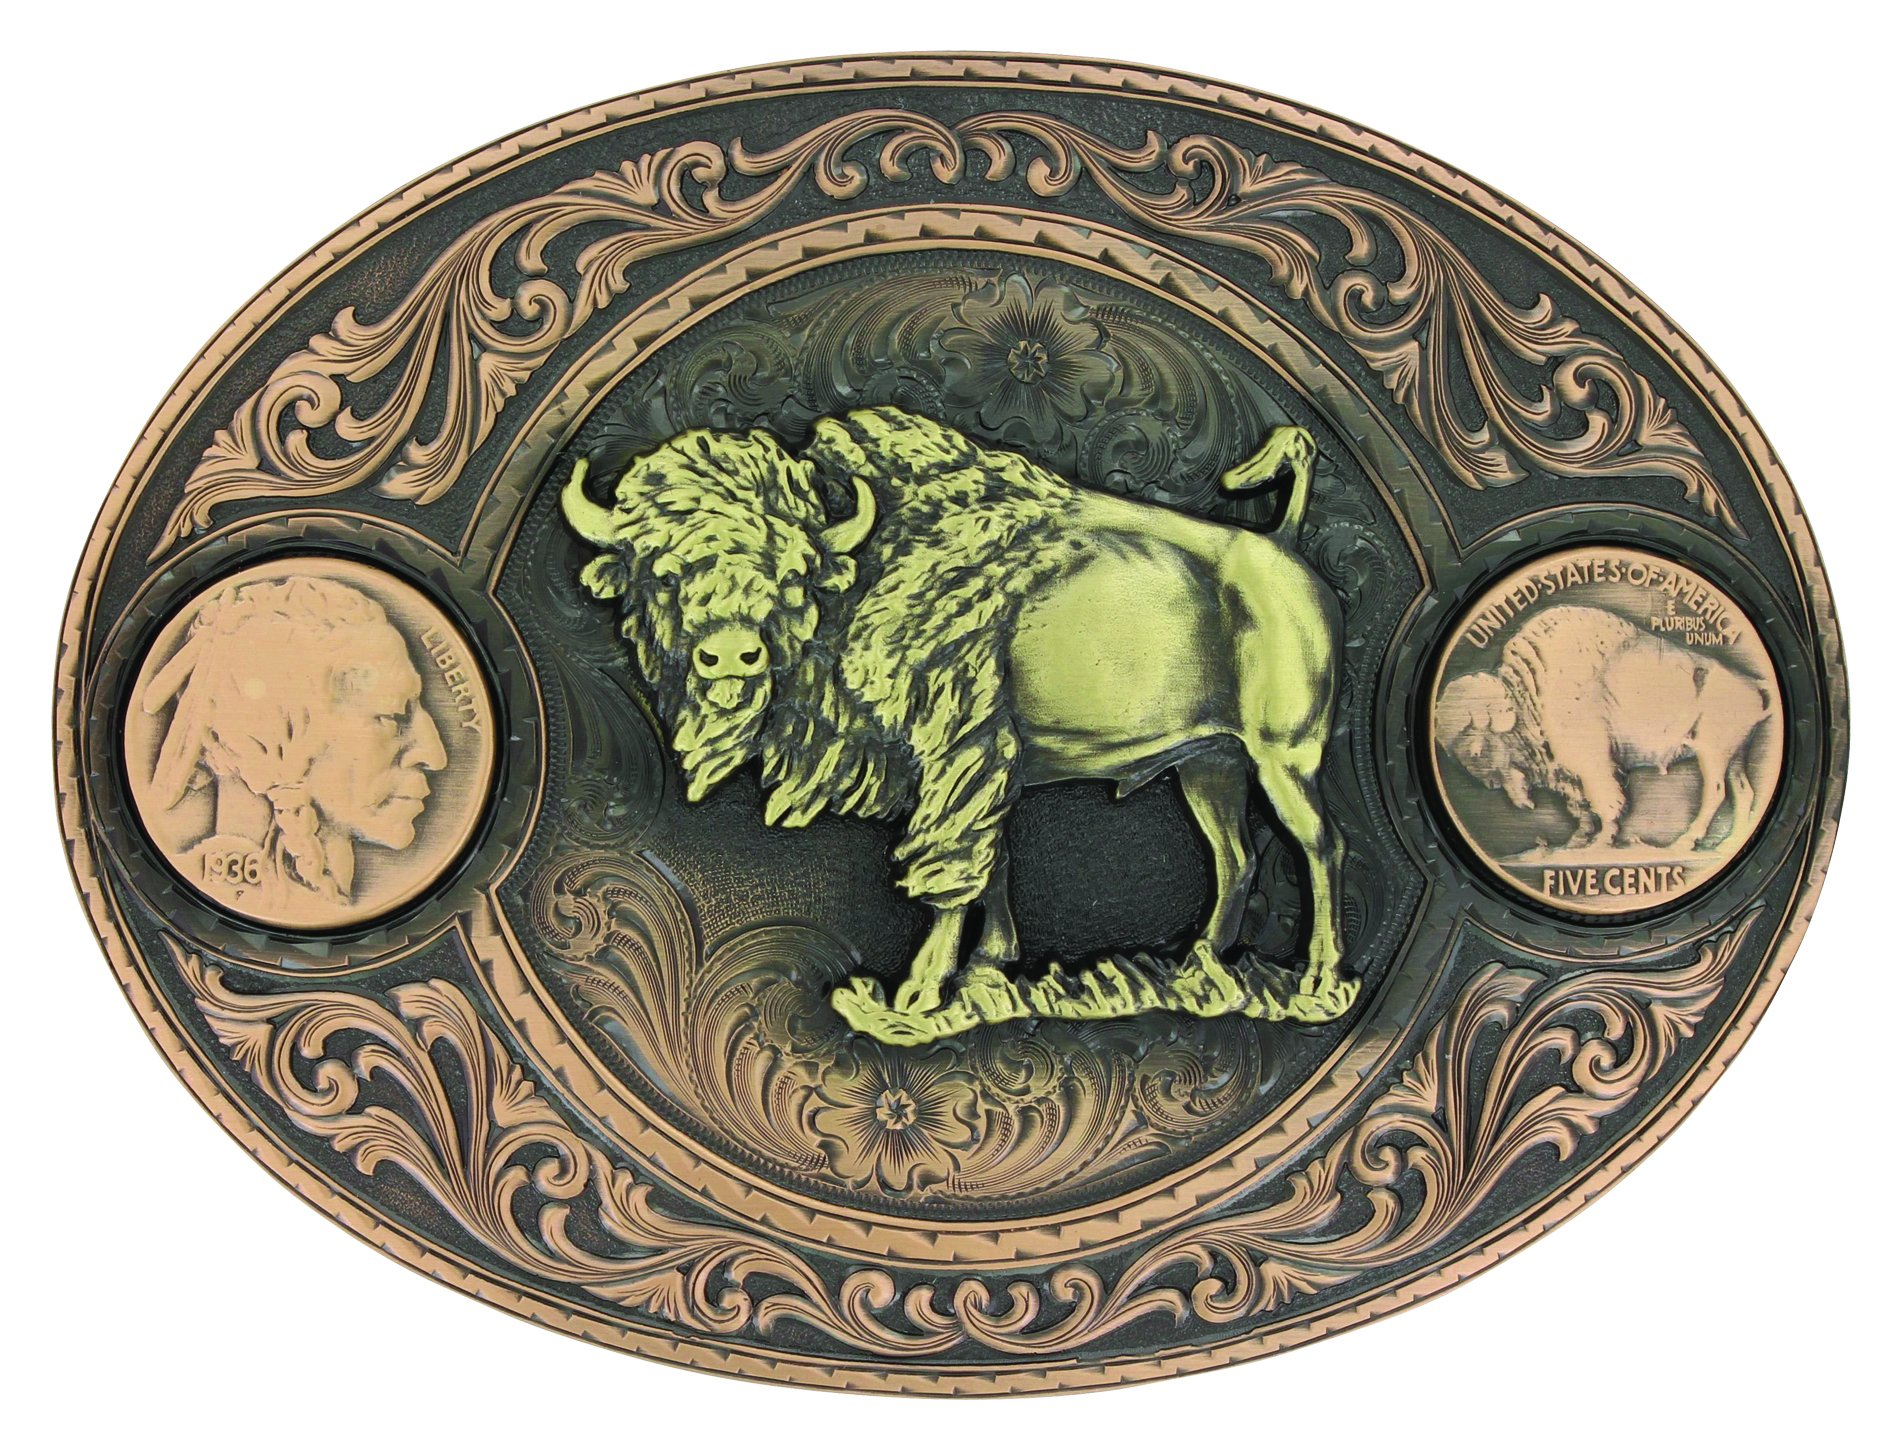 Buffalo Indian Head Nickel Miner's Belt Buckle with Buffalo (4050BLB-941L)